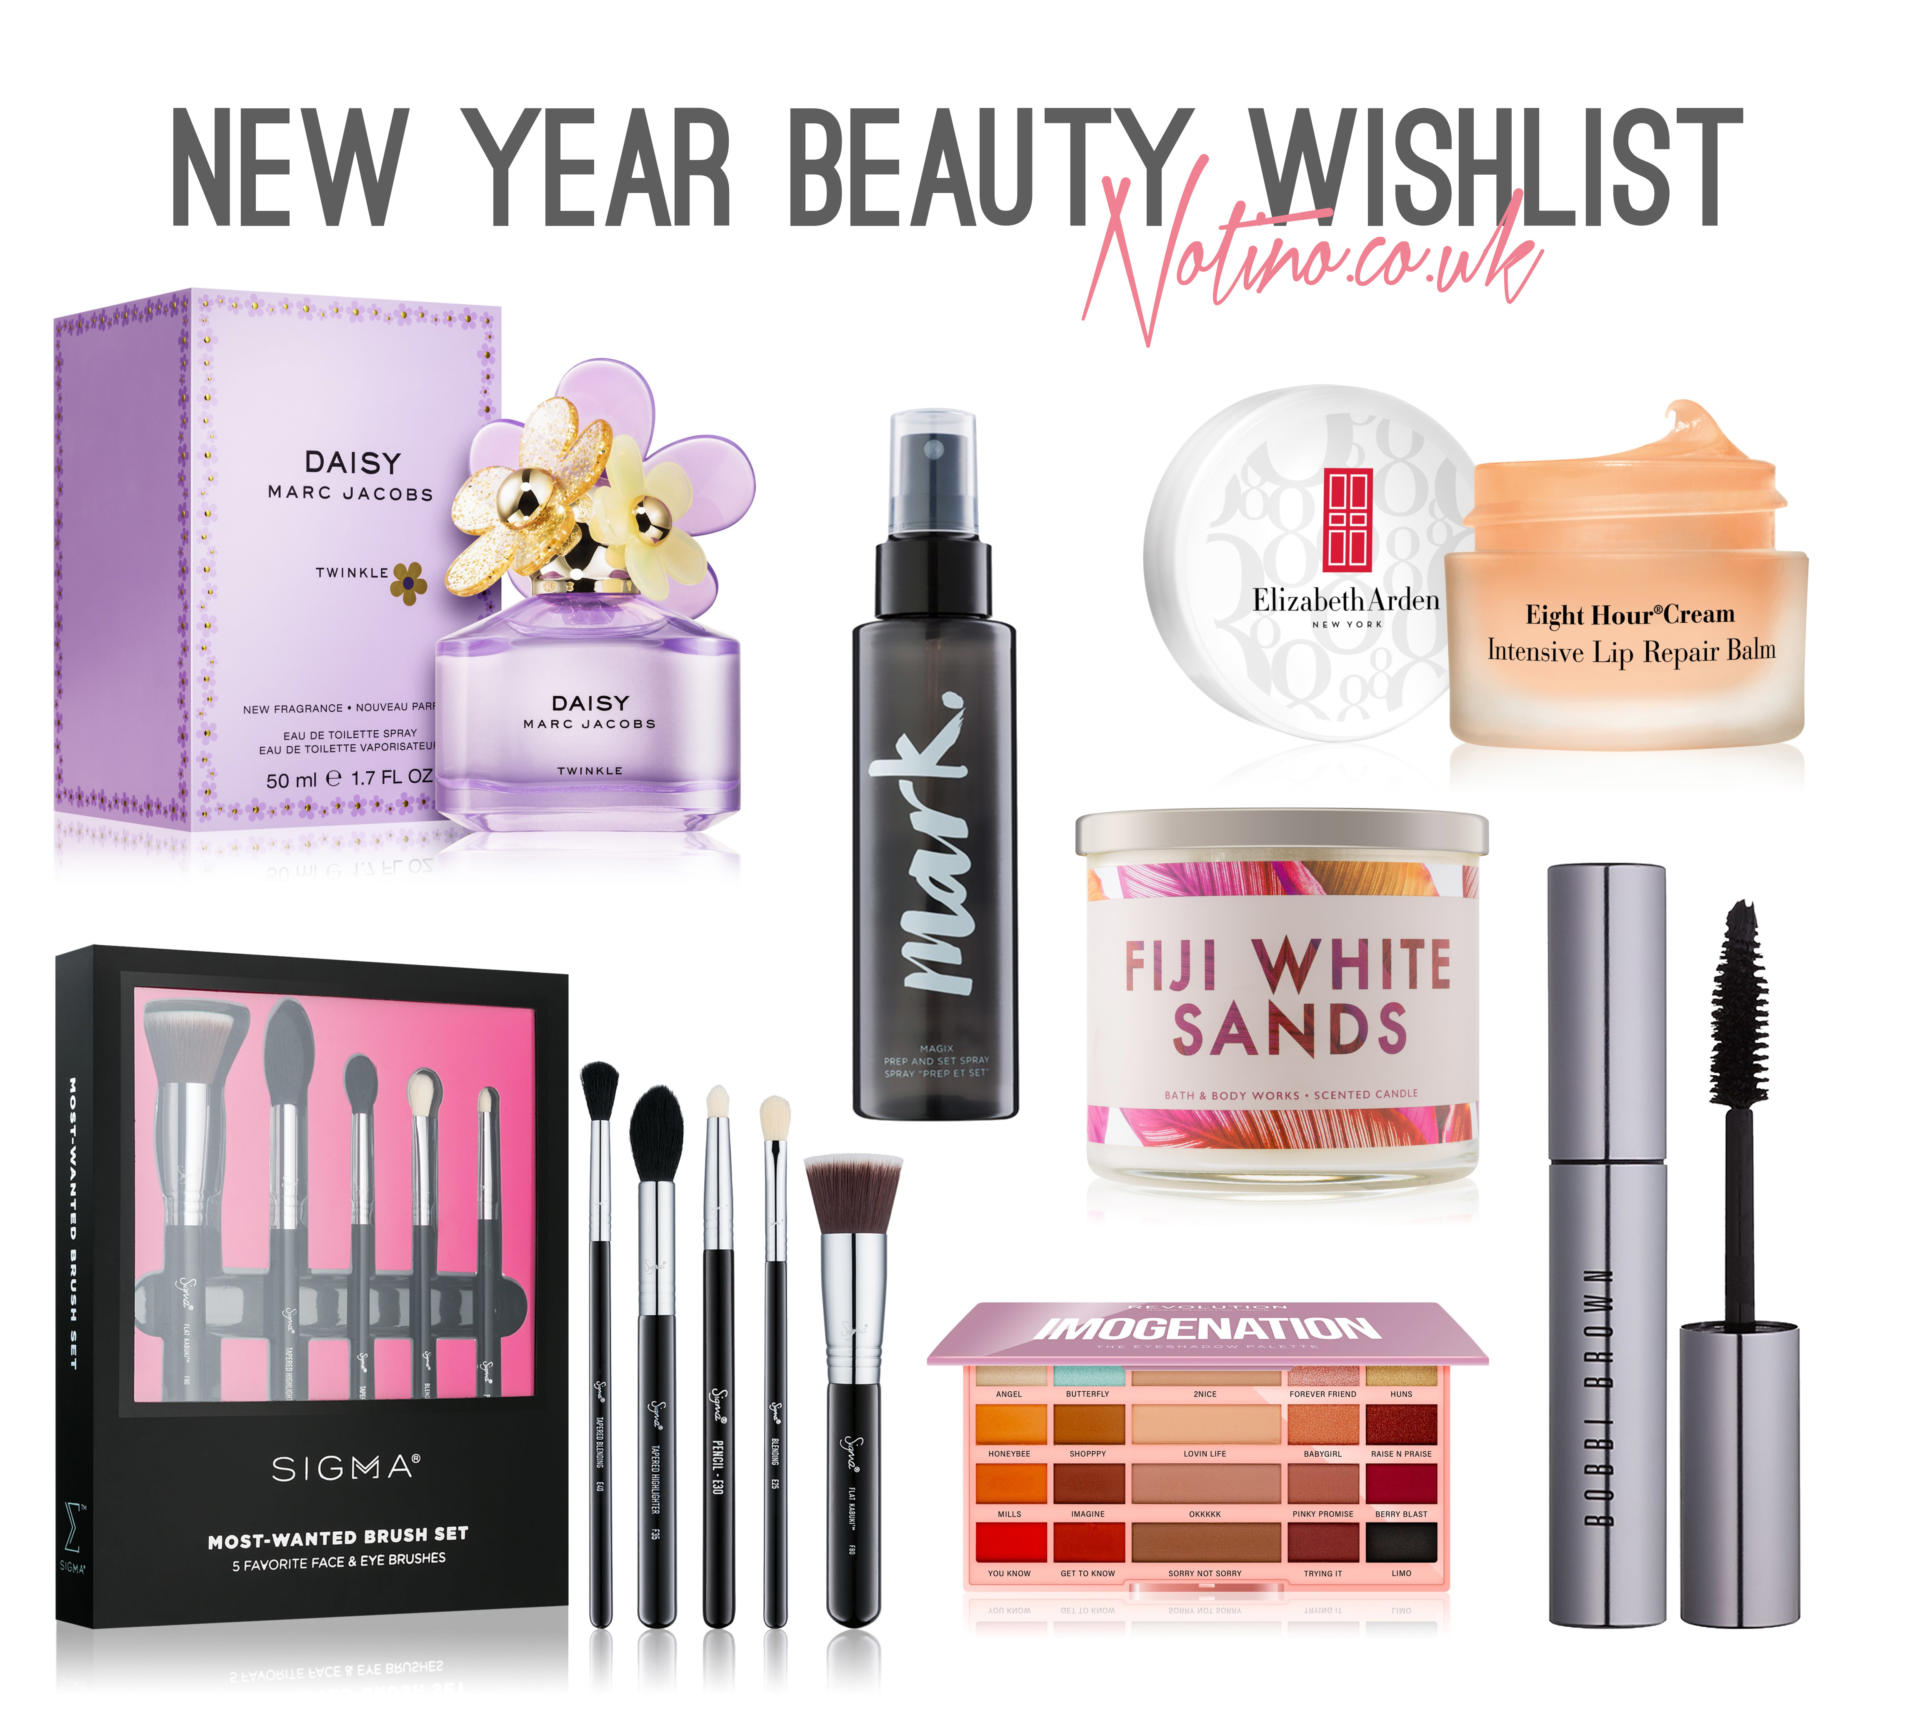 New year beauty at notino.co.uk - Rachel Nicole UK blogger